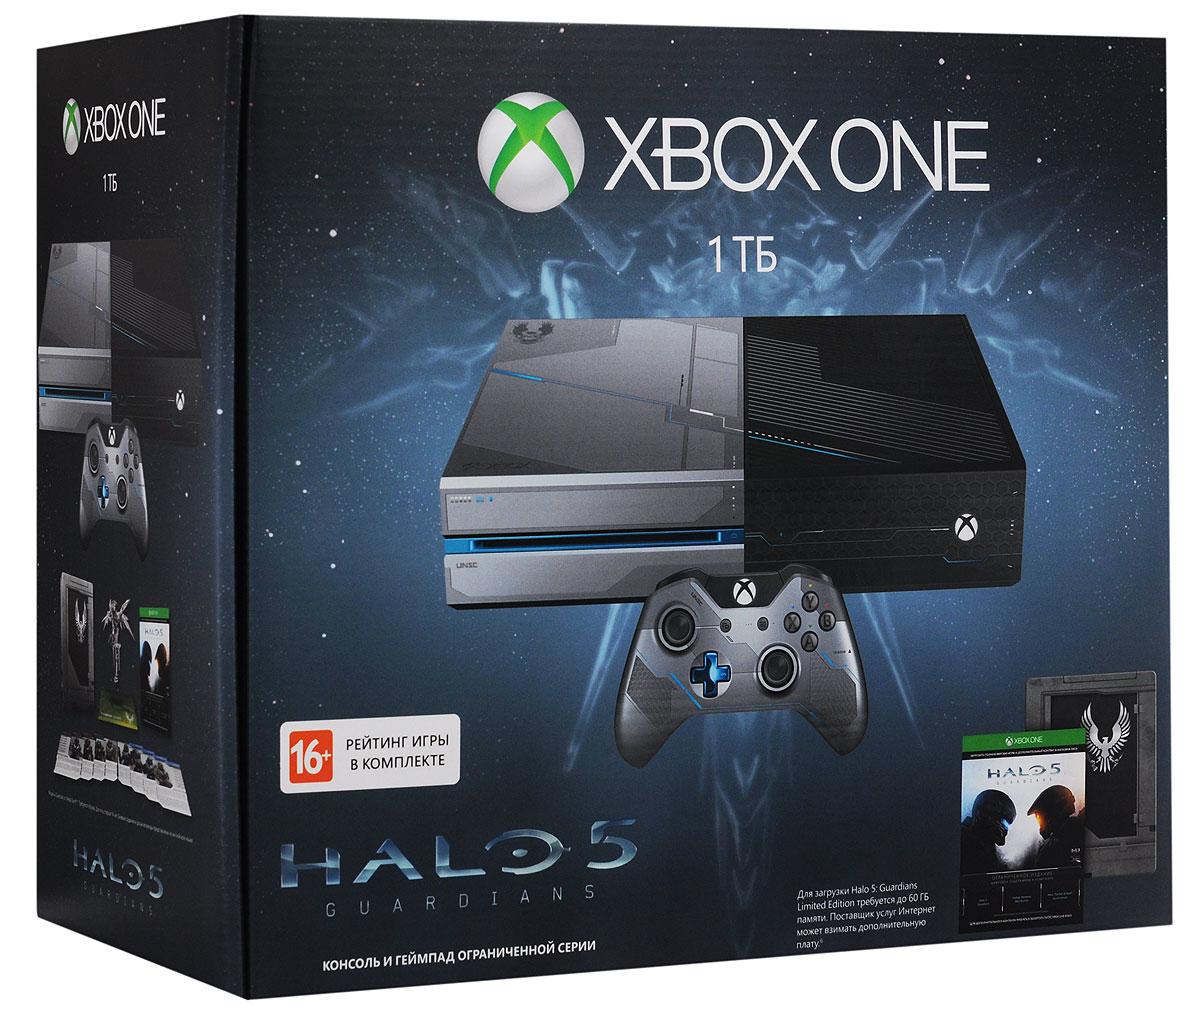 Игровая приставка Xbox One 1 ТБ + Halo 5: Guardians игровая консоль microsoft xbox one s 1 тб [234 00311] игра playerunknown s battlegrounds